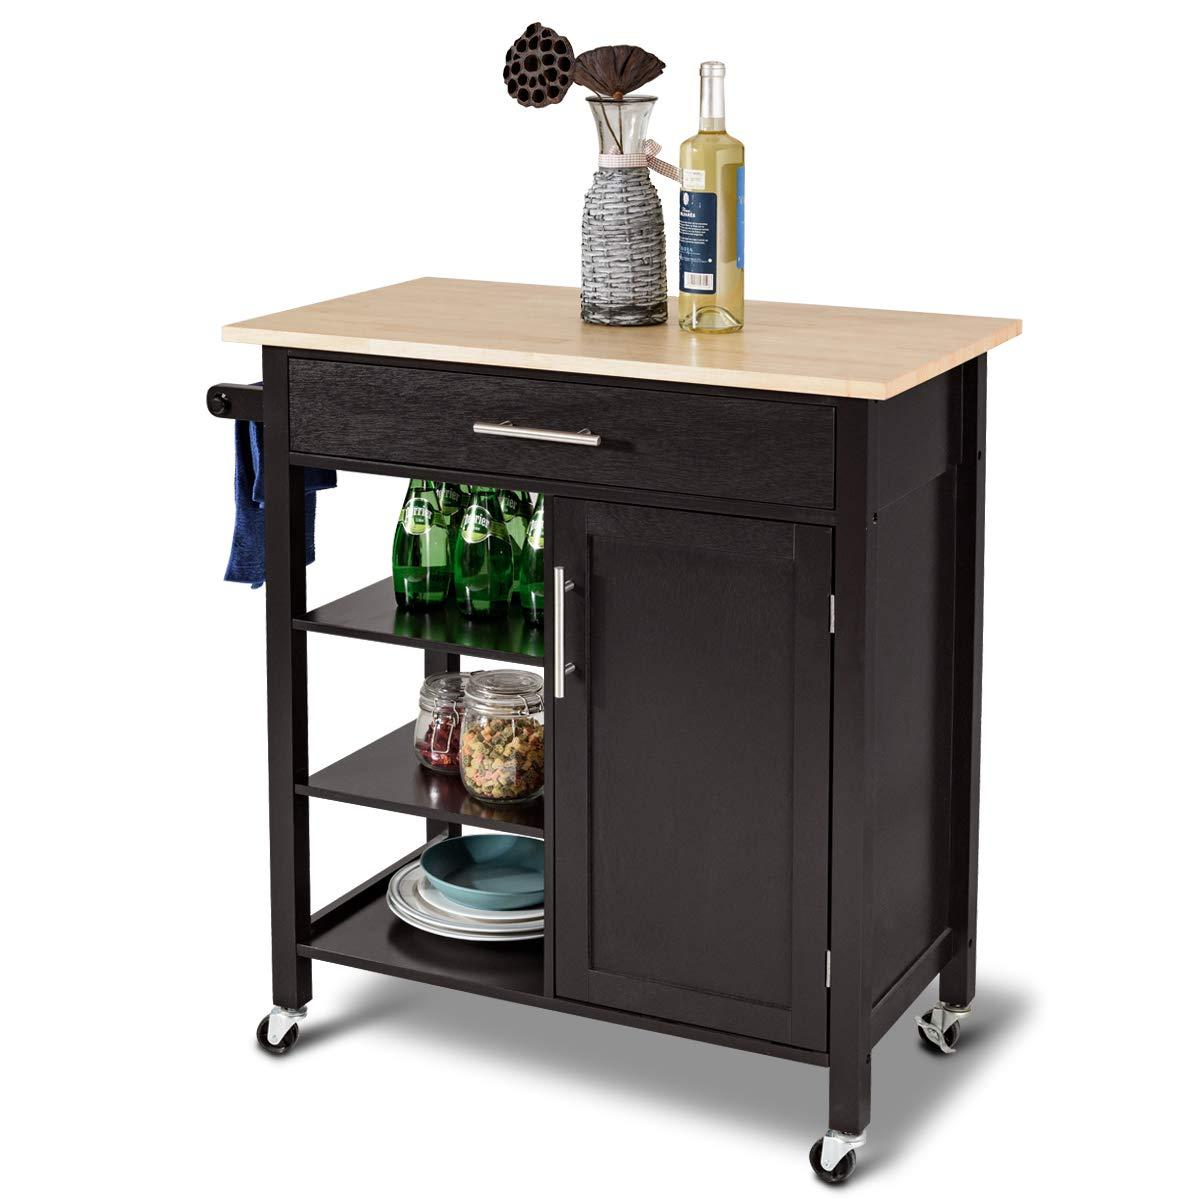 Giantex Kitchen Trolley Cart w/Wheels Rolling Storage Cabinet Wooden Table Multi-Function Island Cart Kitchen Truck (Brown)